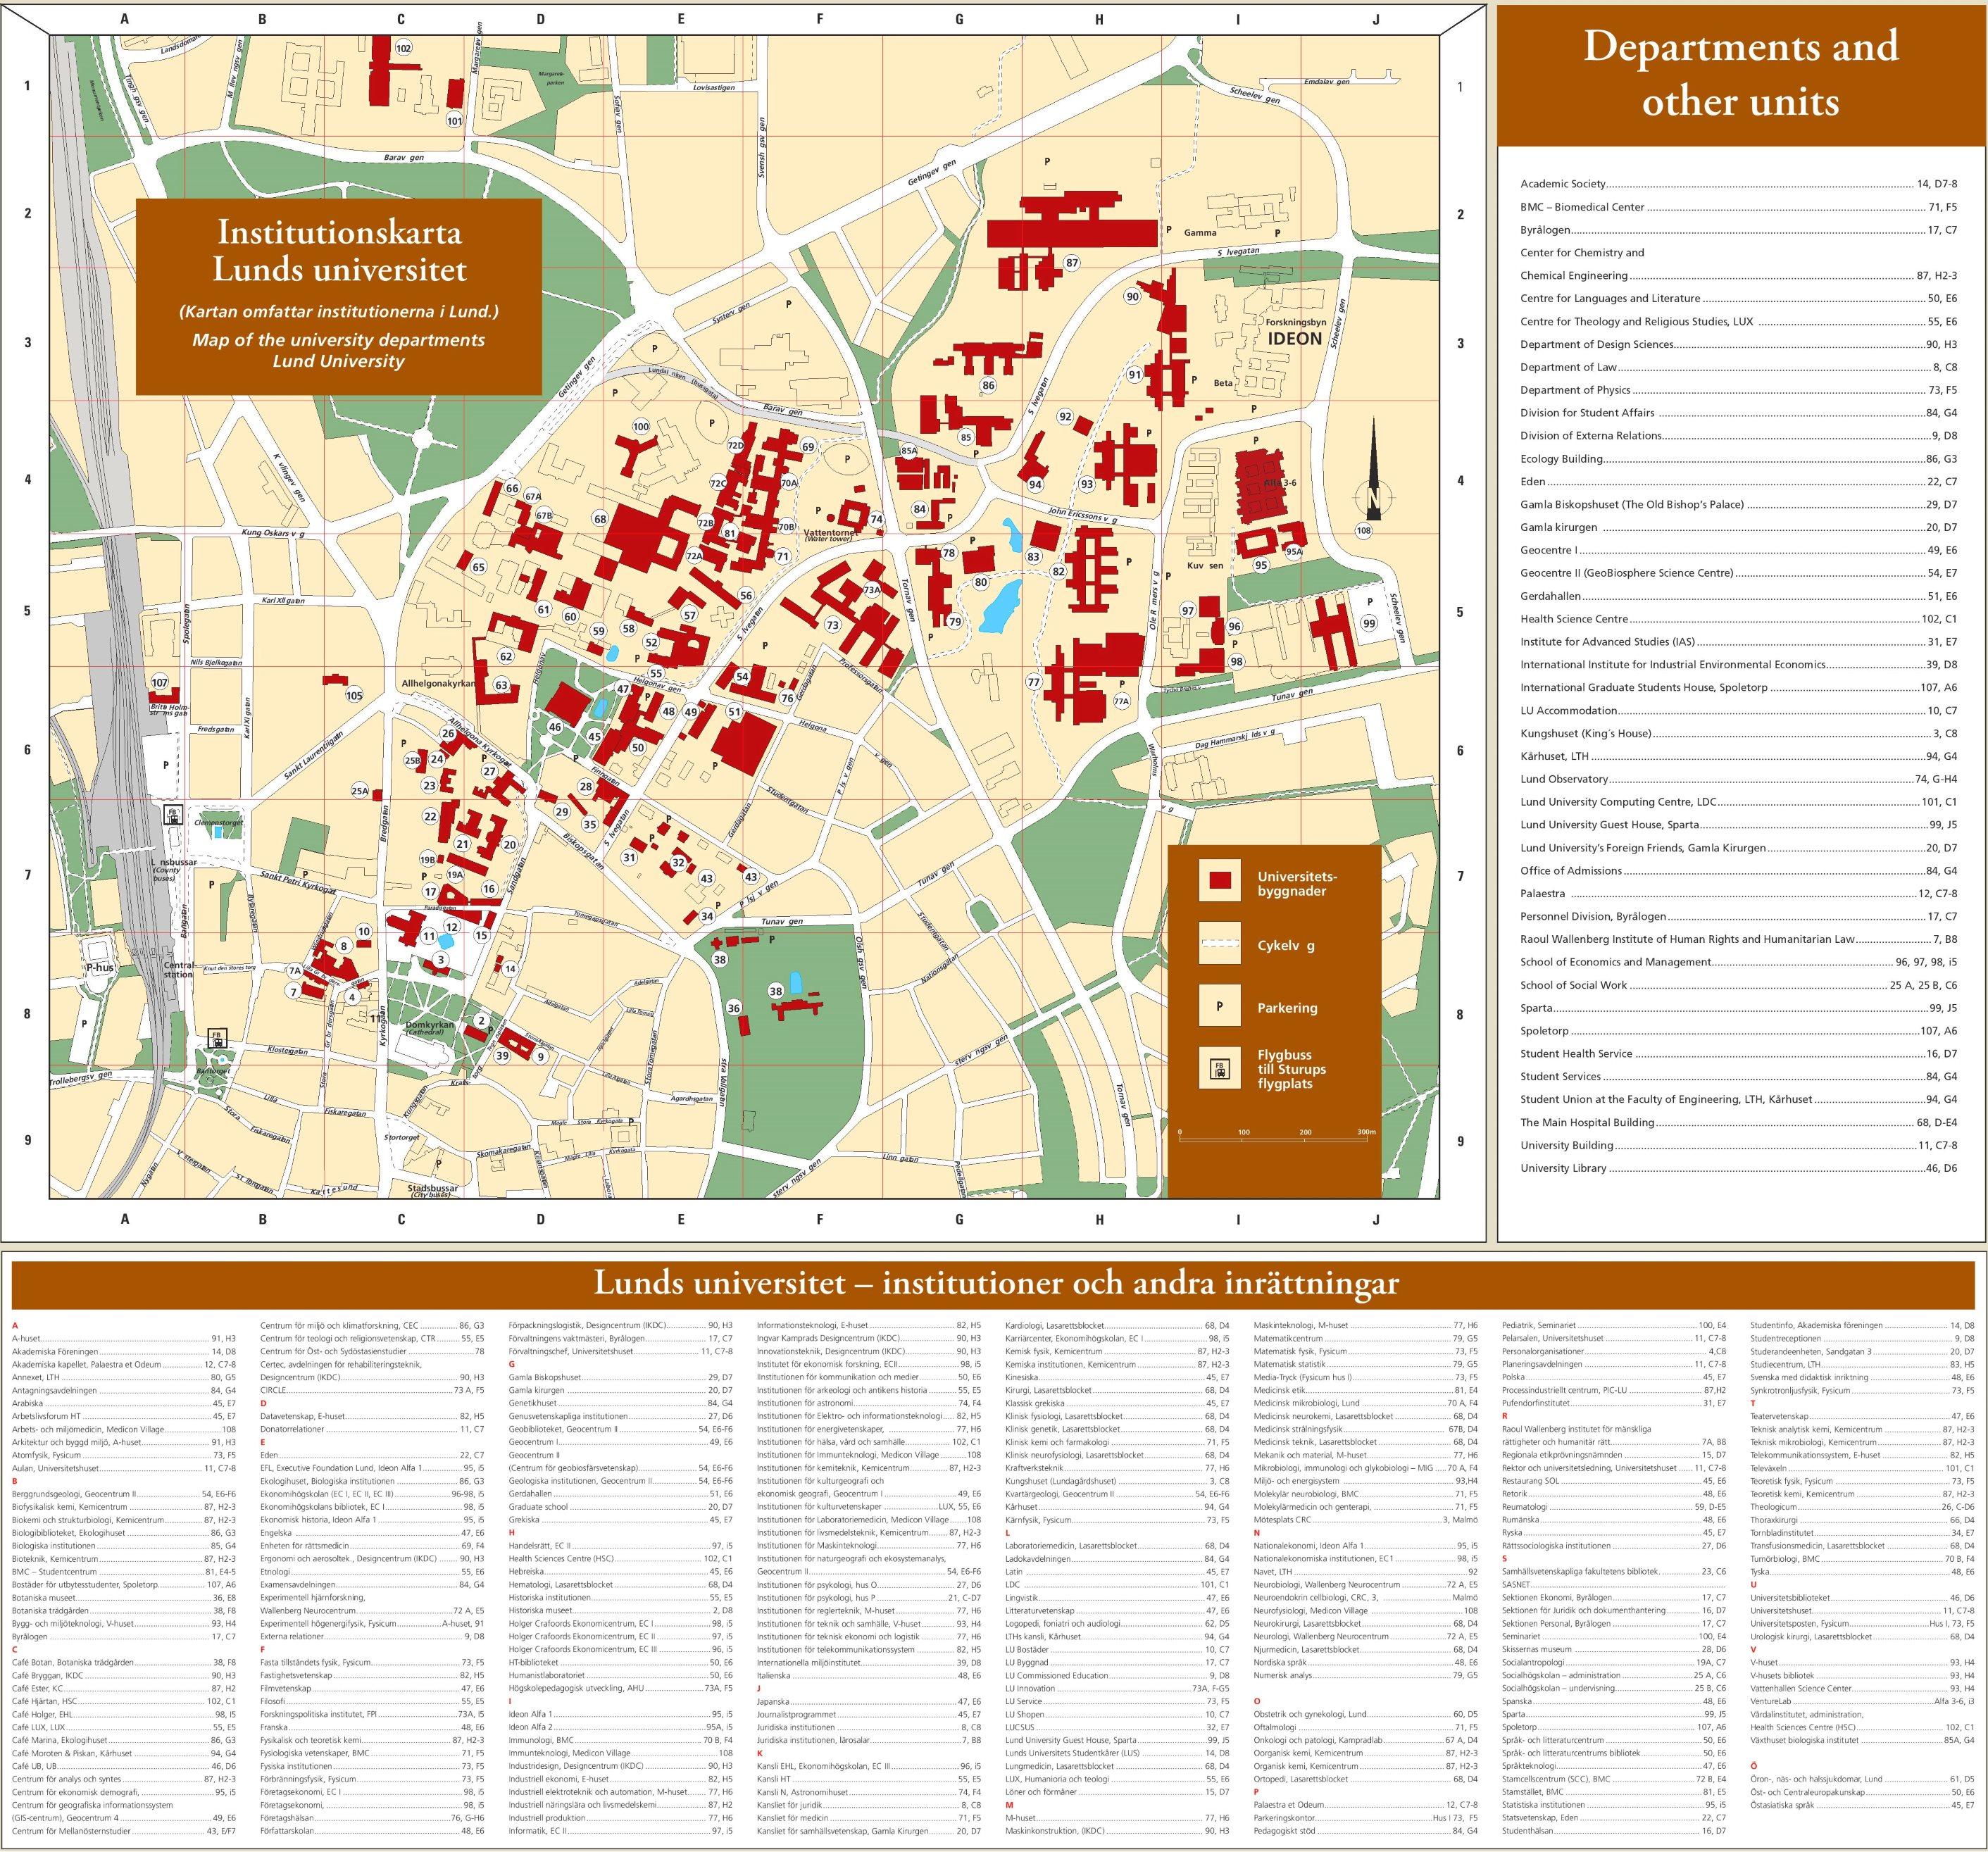 picture regarding University of Arizona Campus Map Printable called Lund campus map